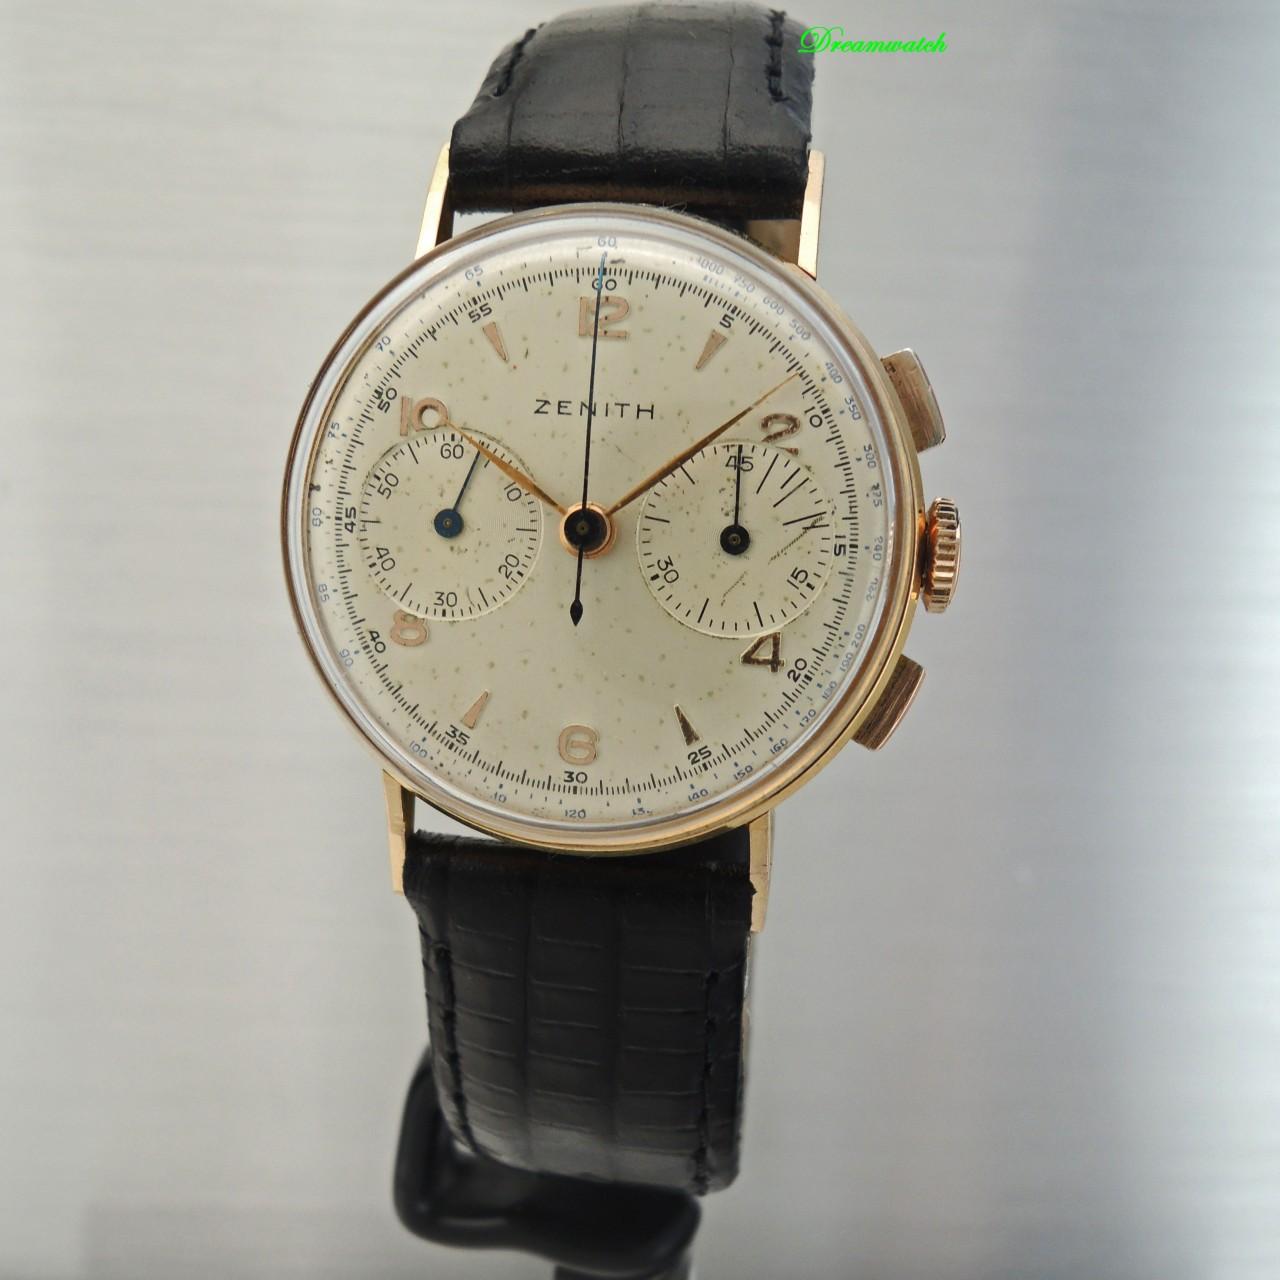 Vintage Zenith Chronograph Cal.136